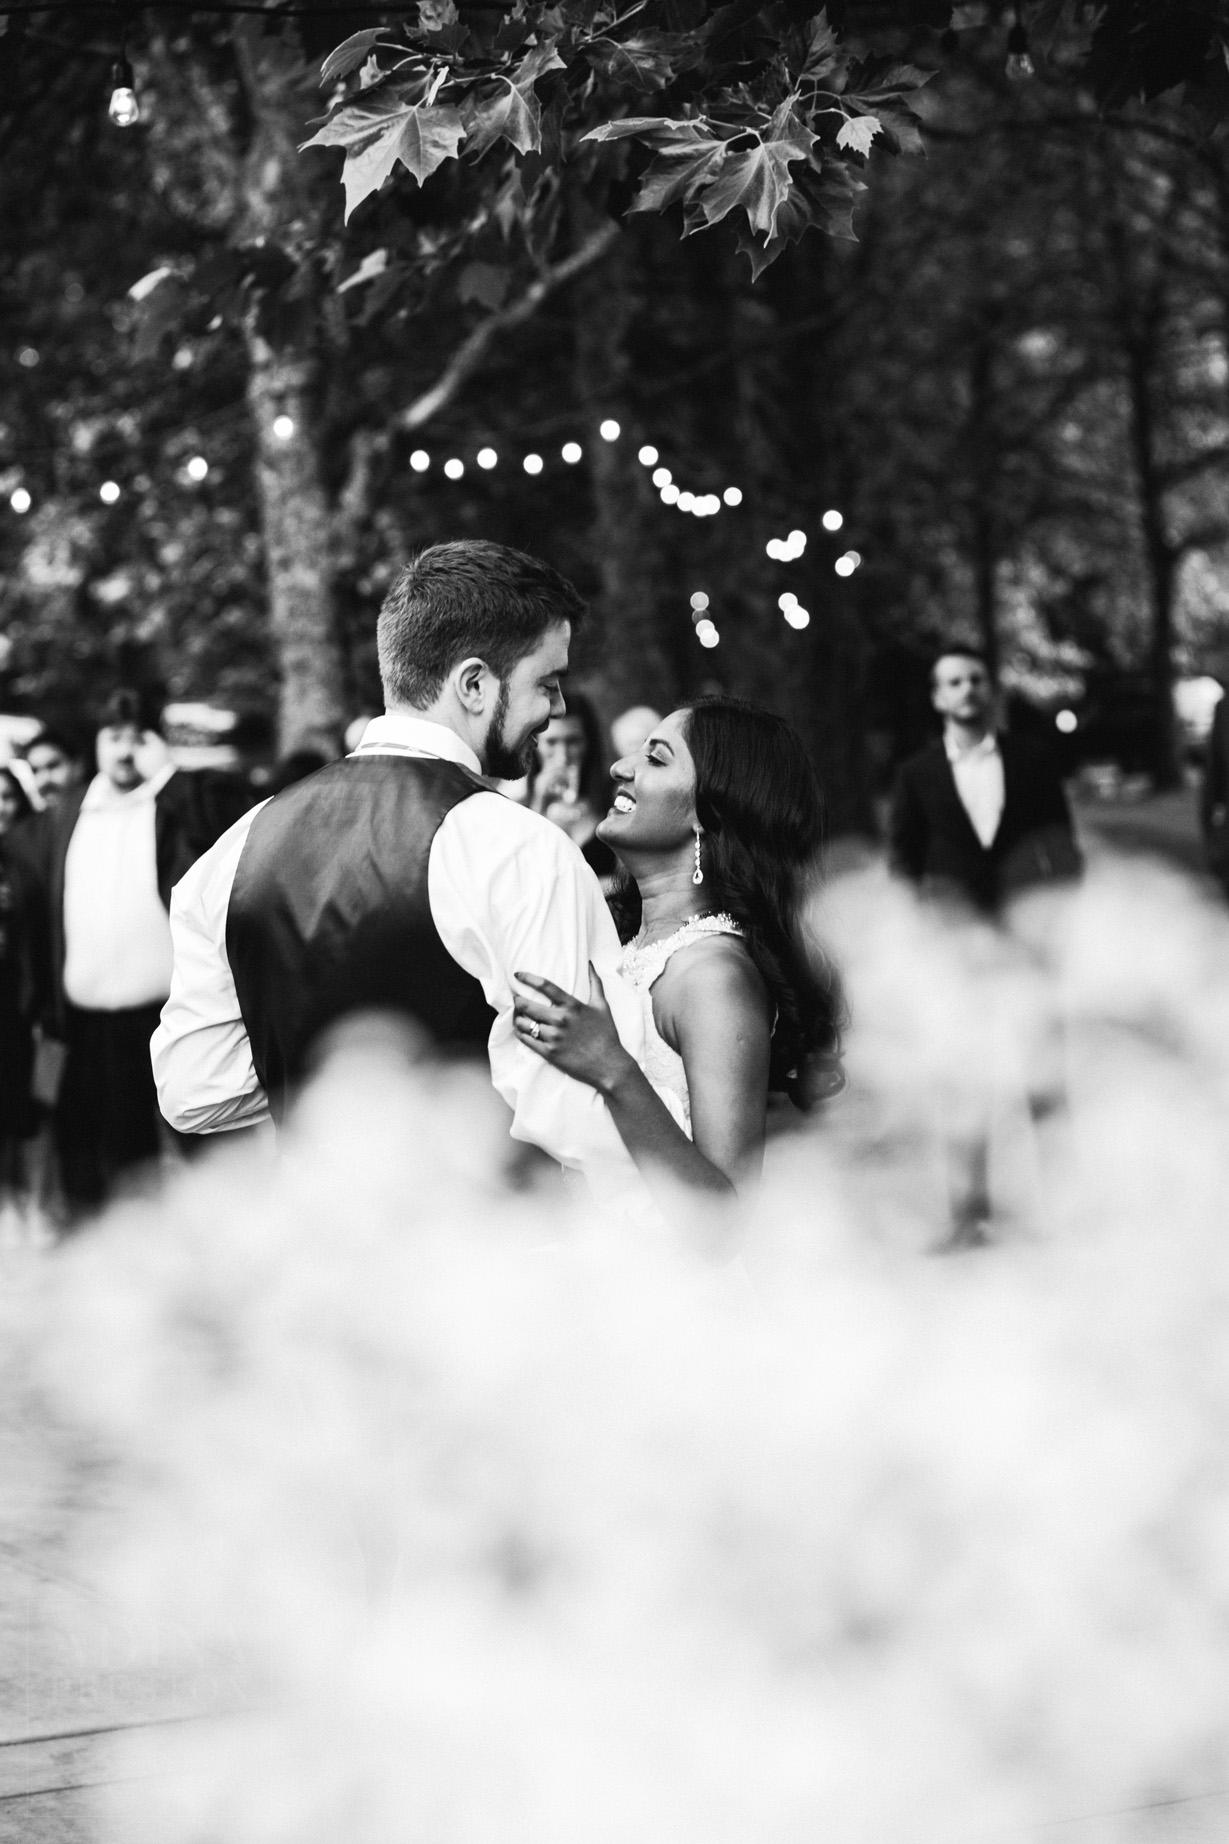 Hima+Dan_Wedding_Seattle+Couple_Kingston_6112016_366.jpg